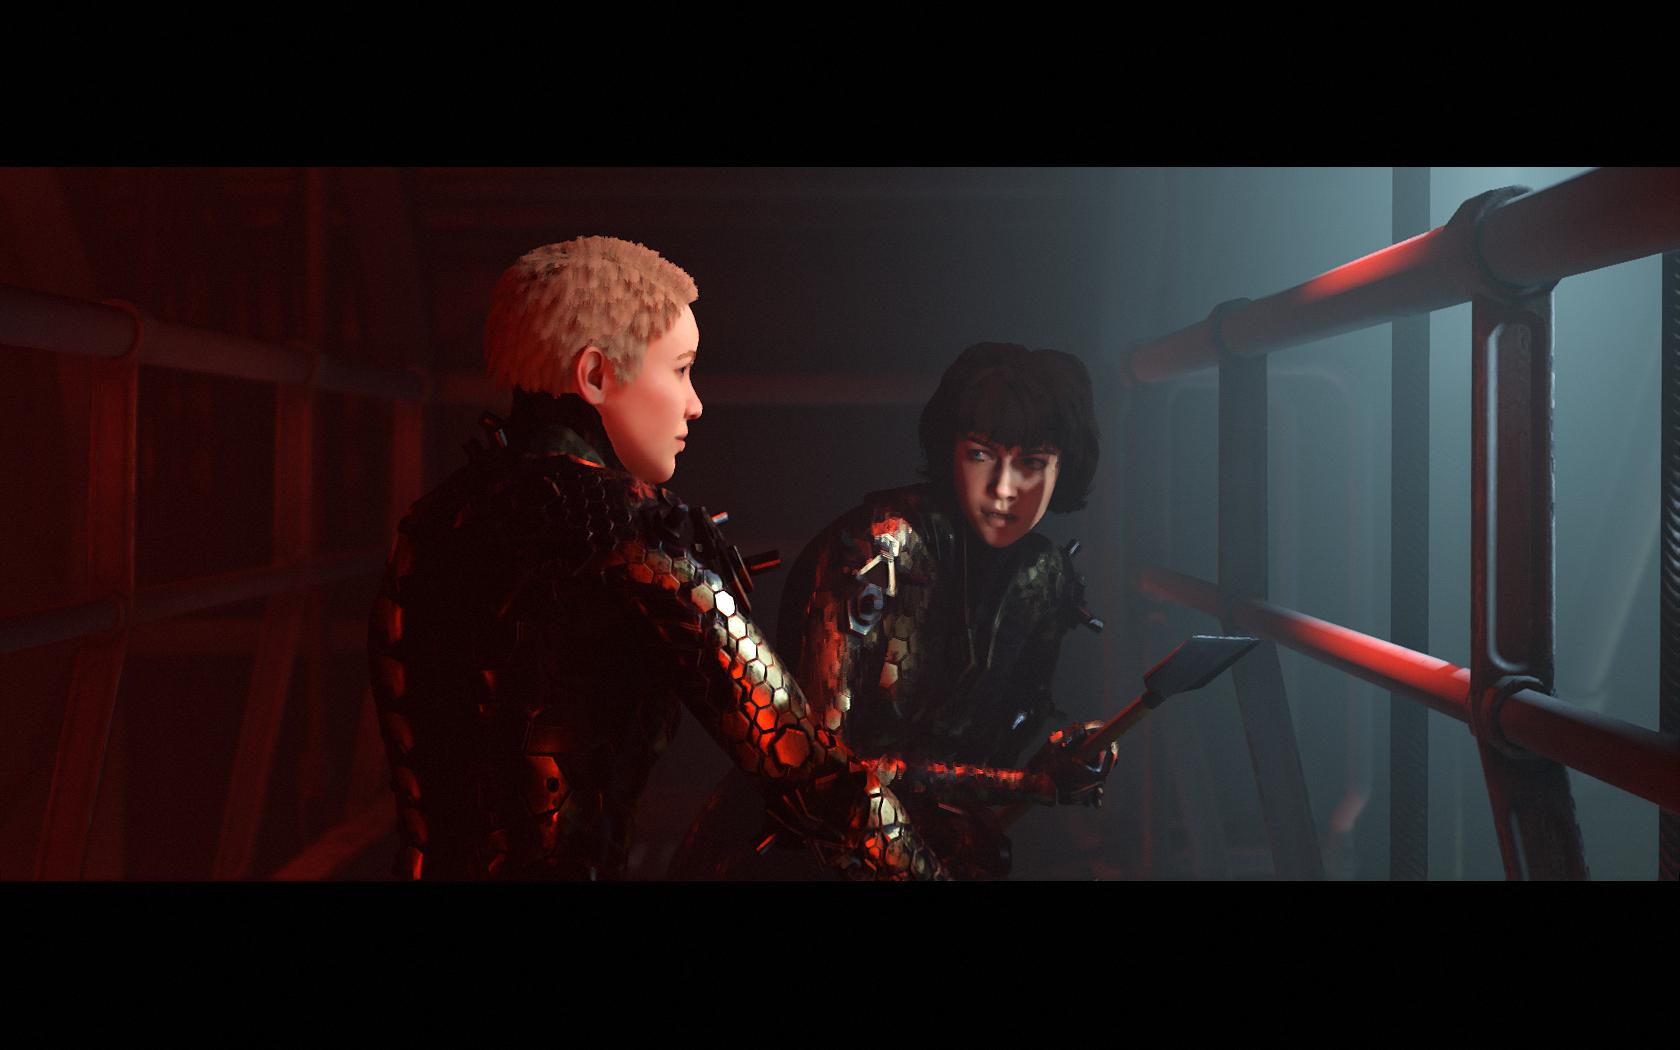 Wolfenstein  Youngblood Screenshot 2019.07.27 - 05.21.28.31.png